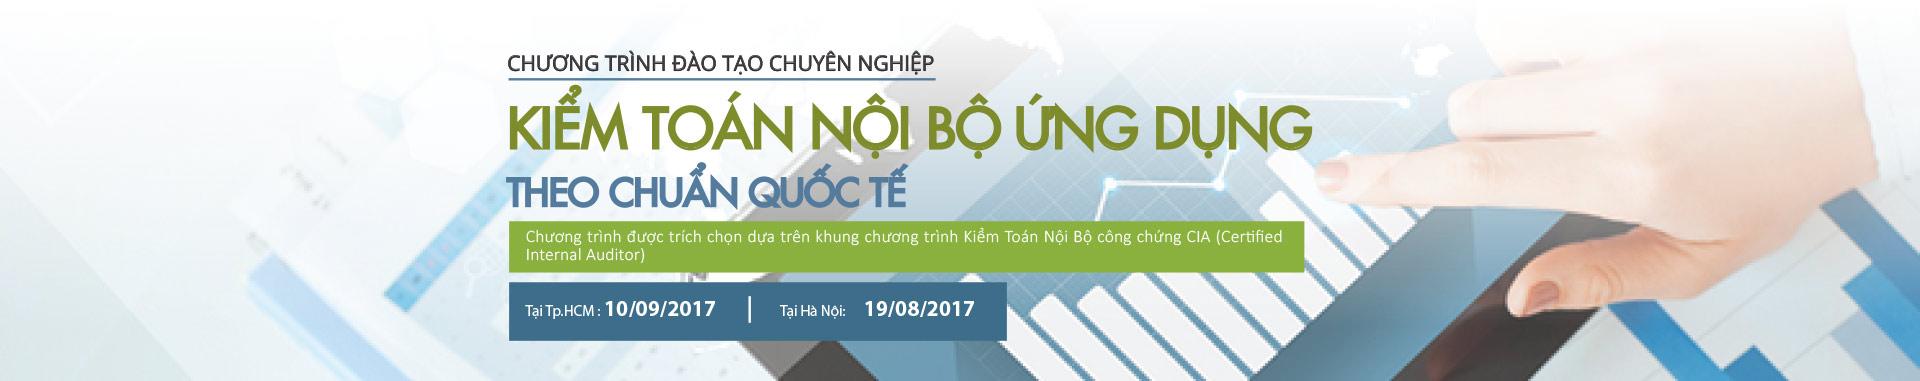 banner-web-ktnb-ung-dung-100917